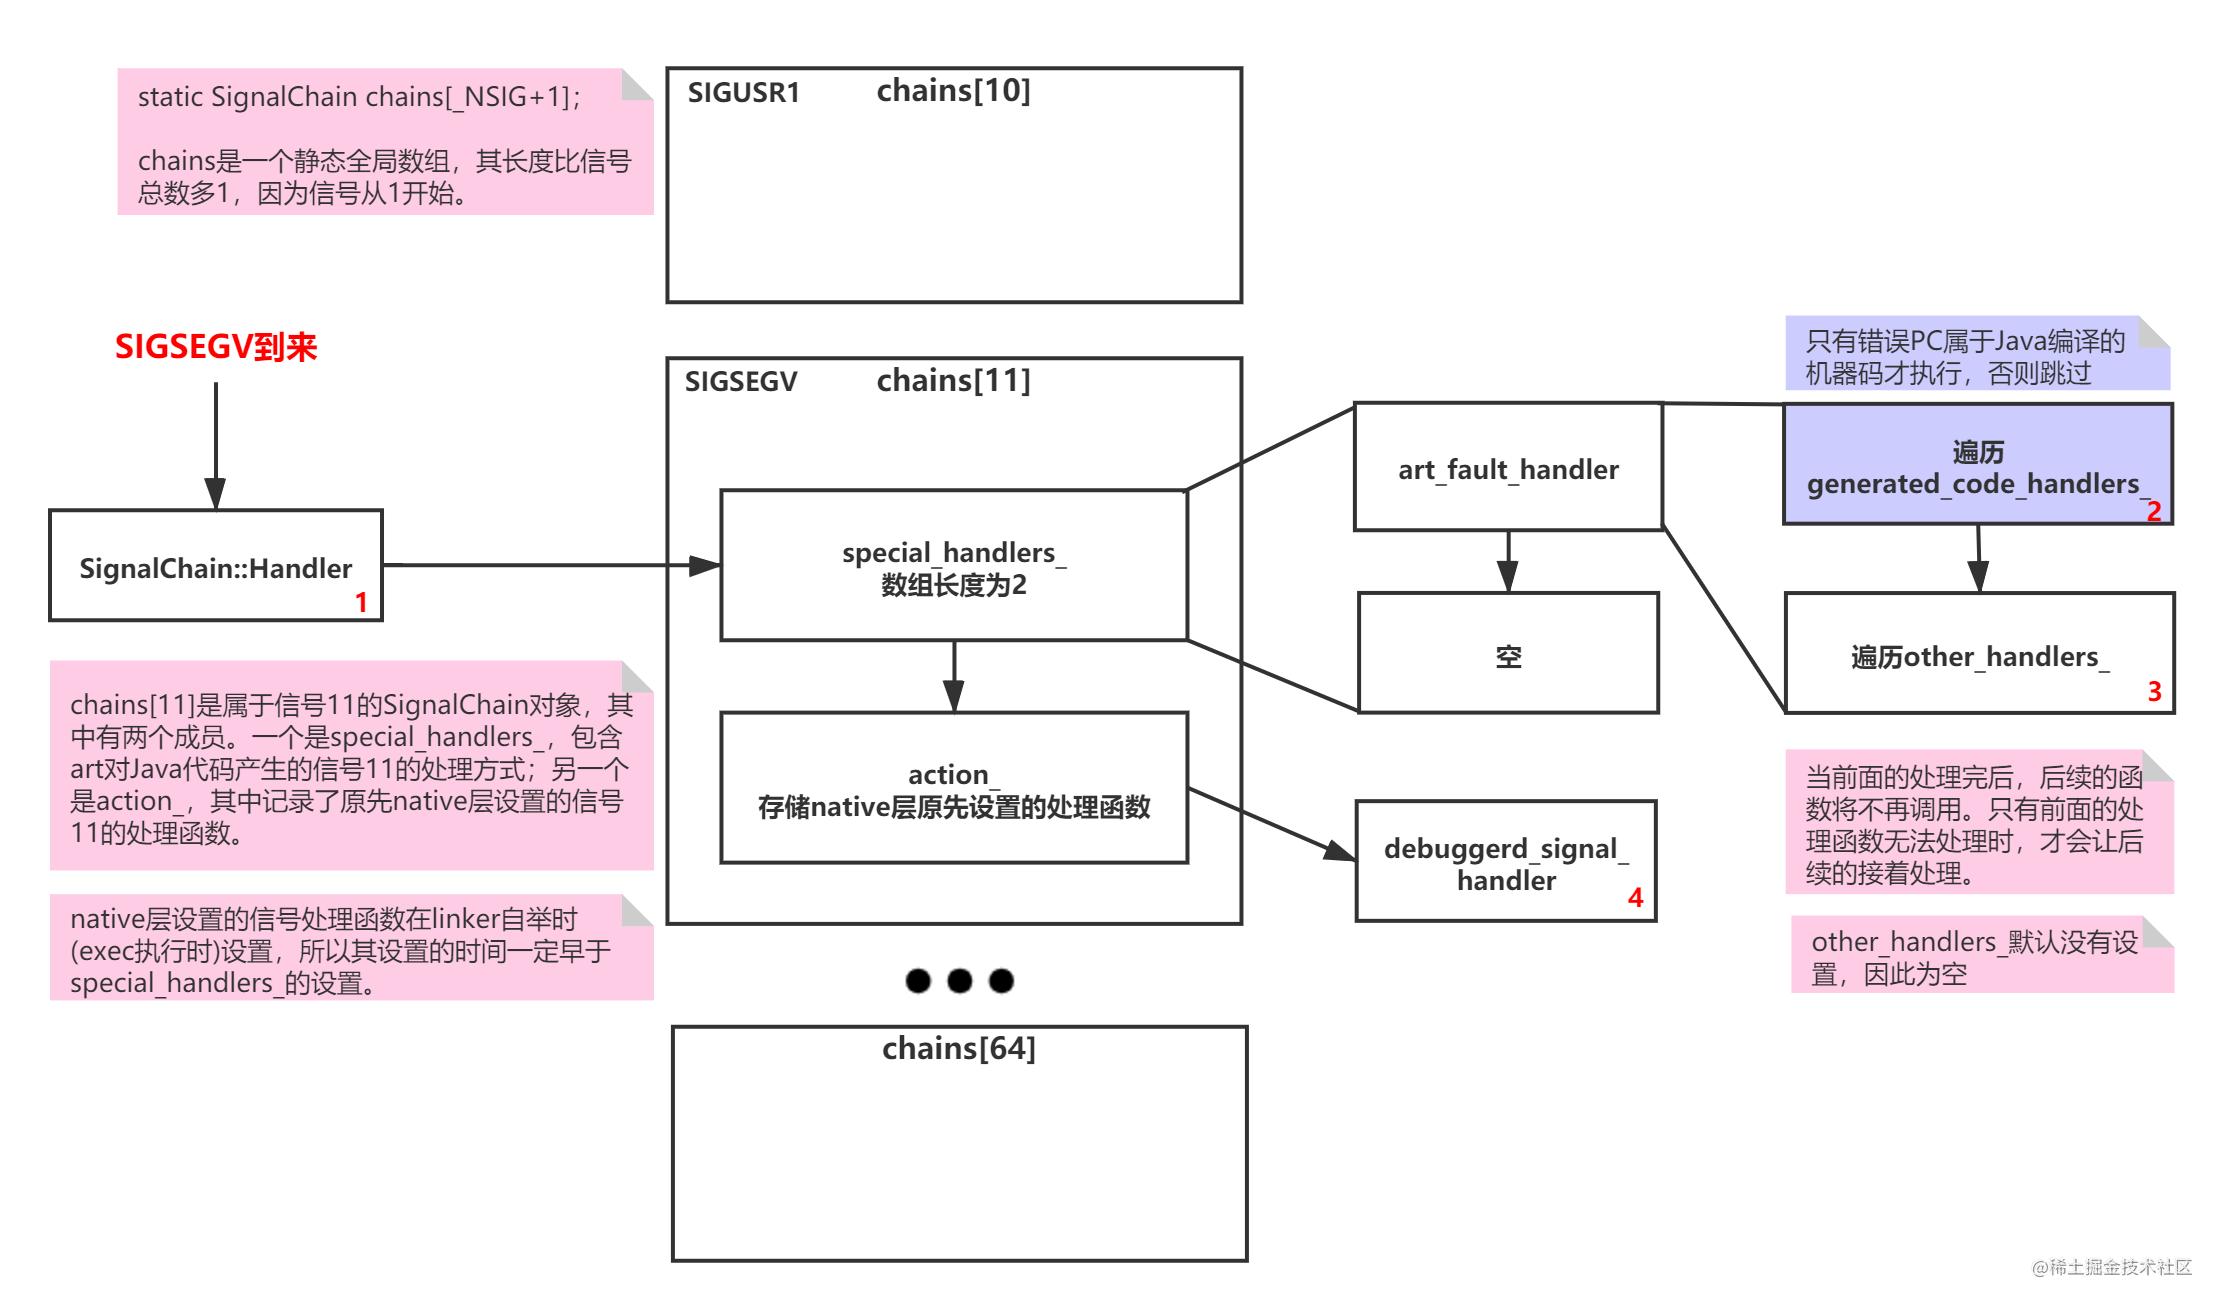 ART虚拟机 | Android应用中SIGSEGV信号的处理流程